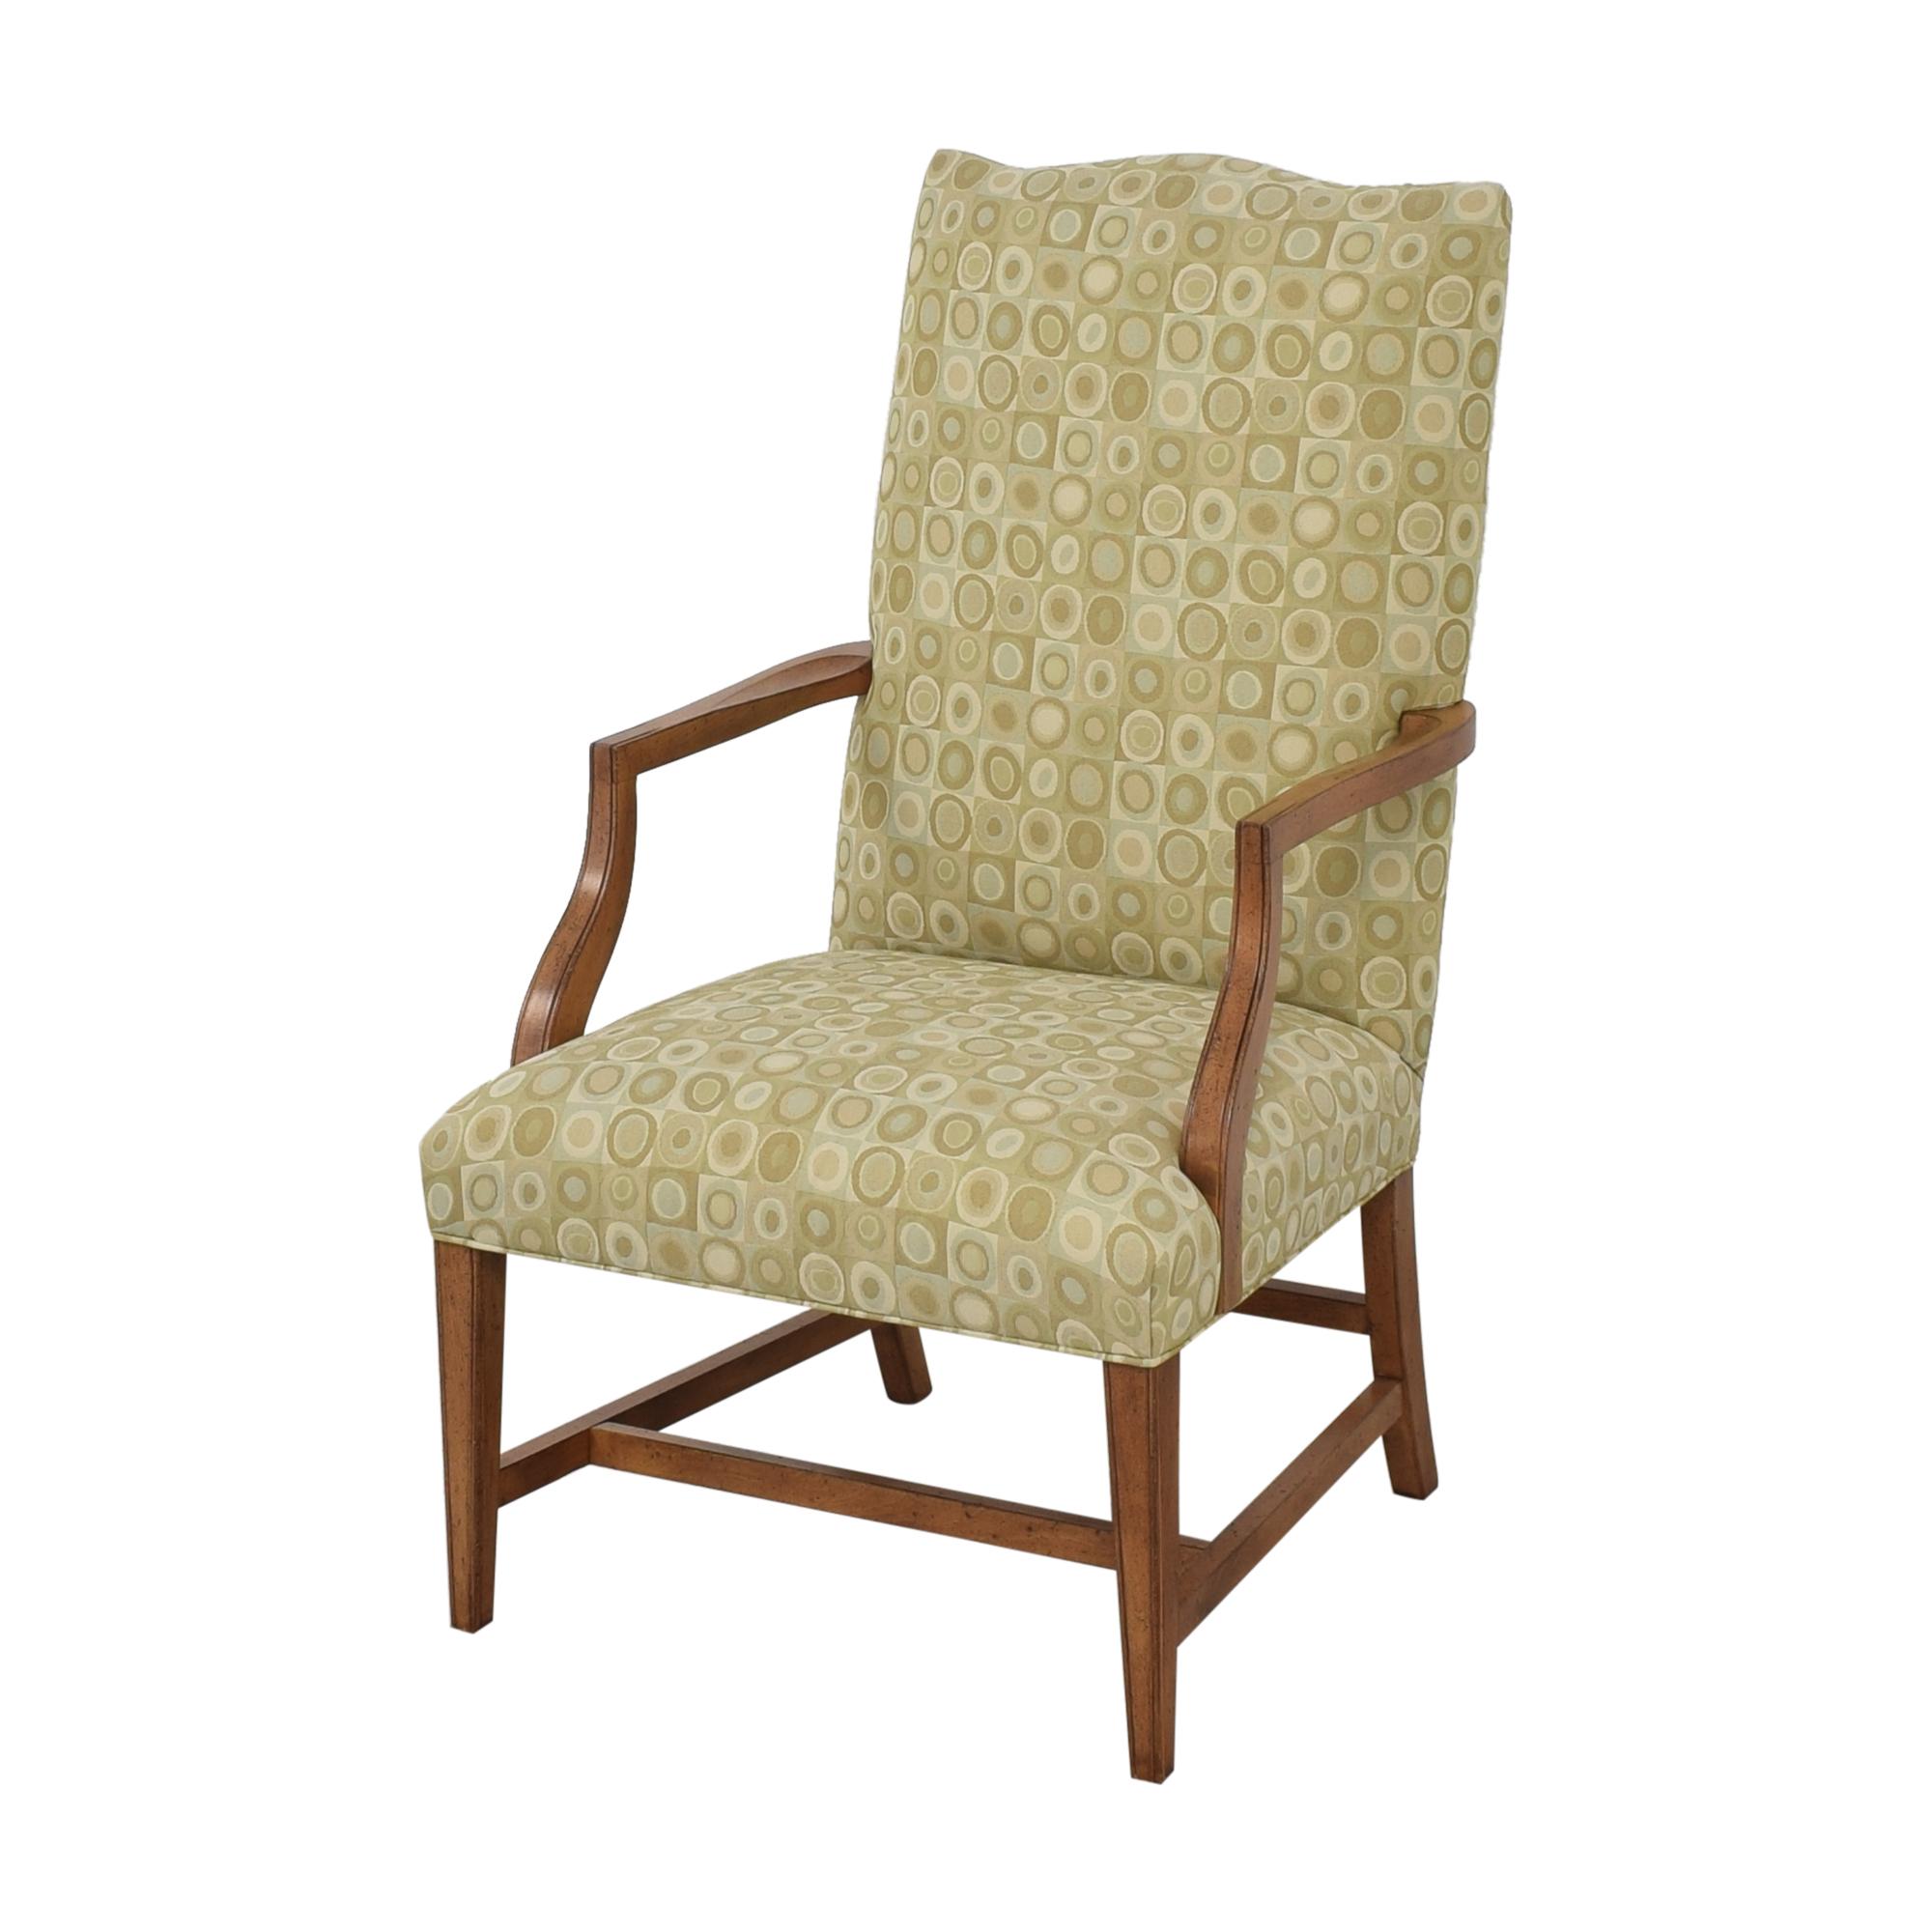 shop Ethan Allen Accent Chair Ethan Allen Accent Chairs